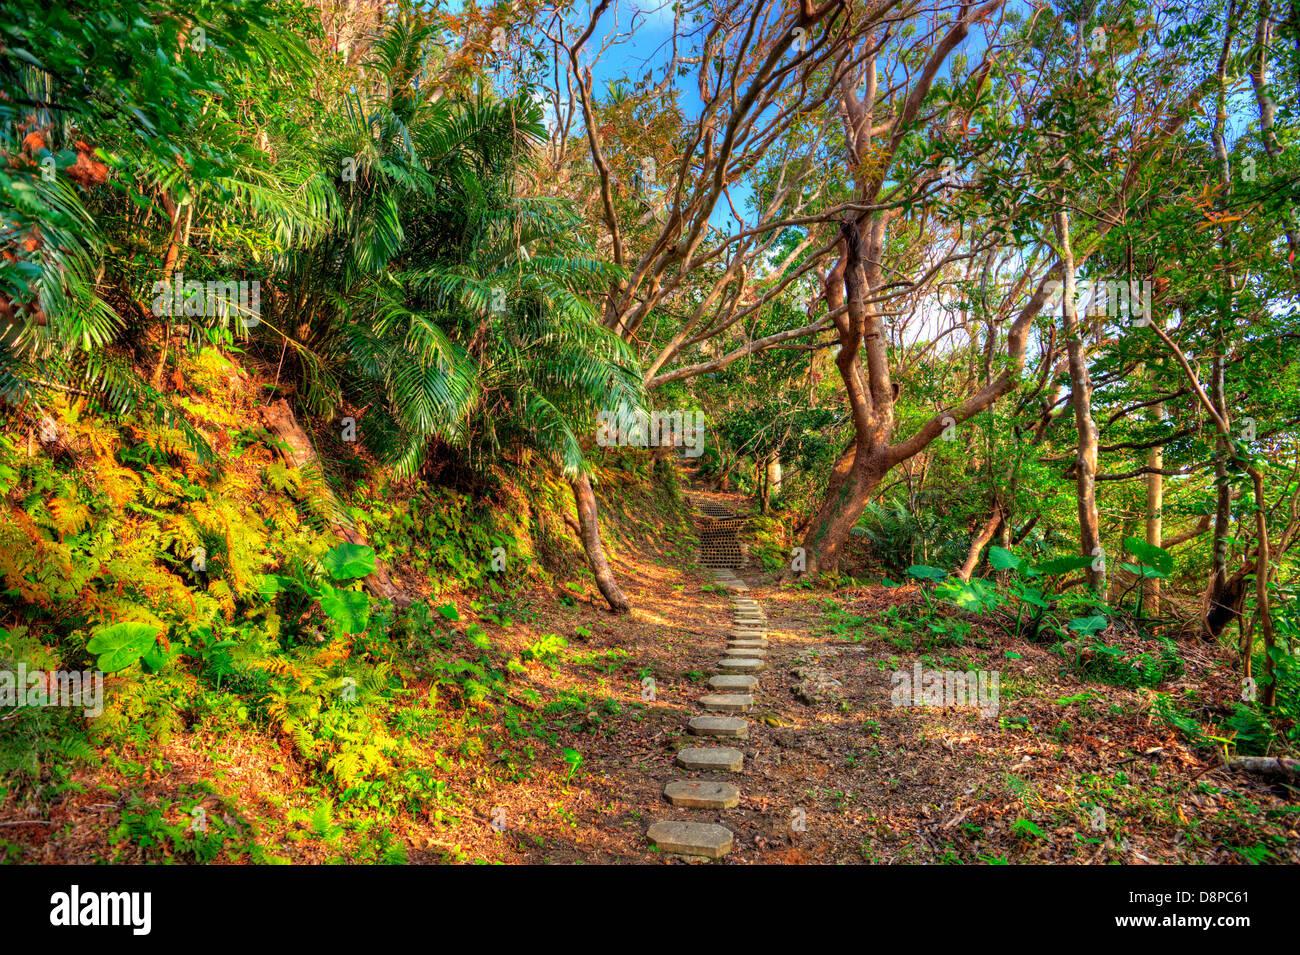 Hiking trail the jungle of Okinawa, Japan. - Stock Image